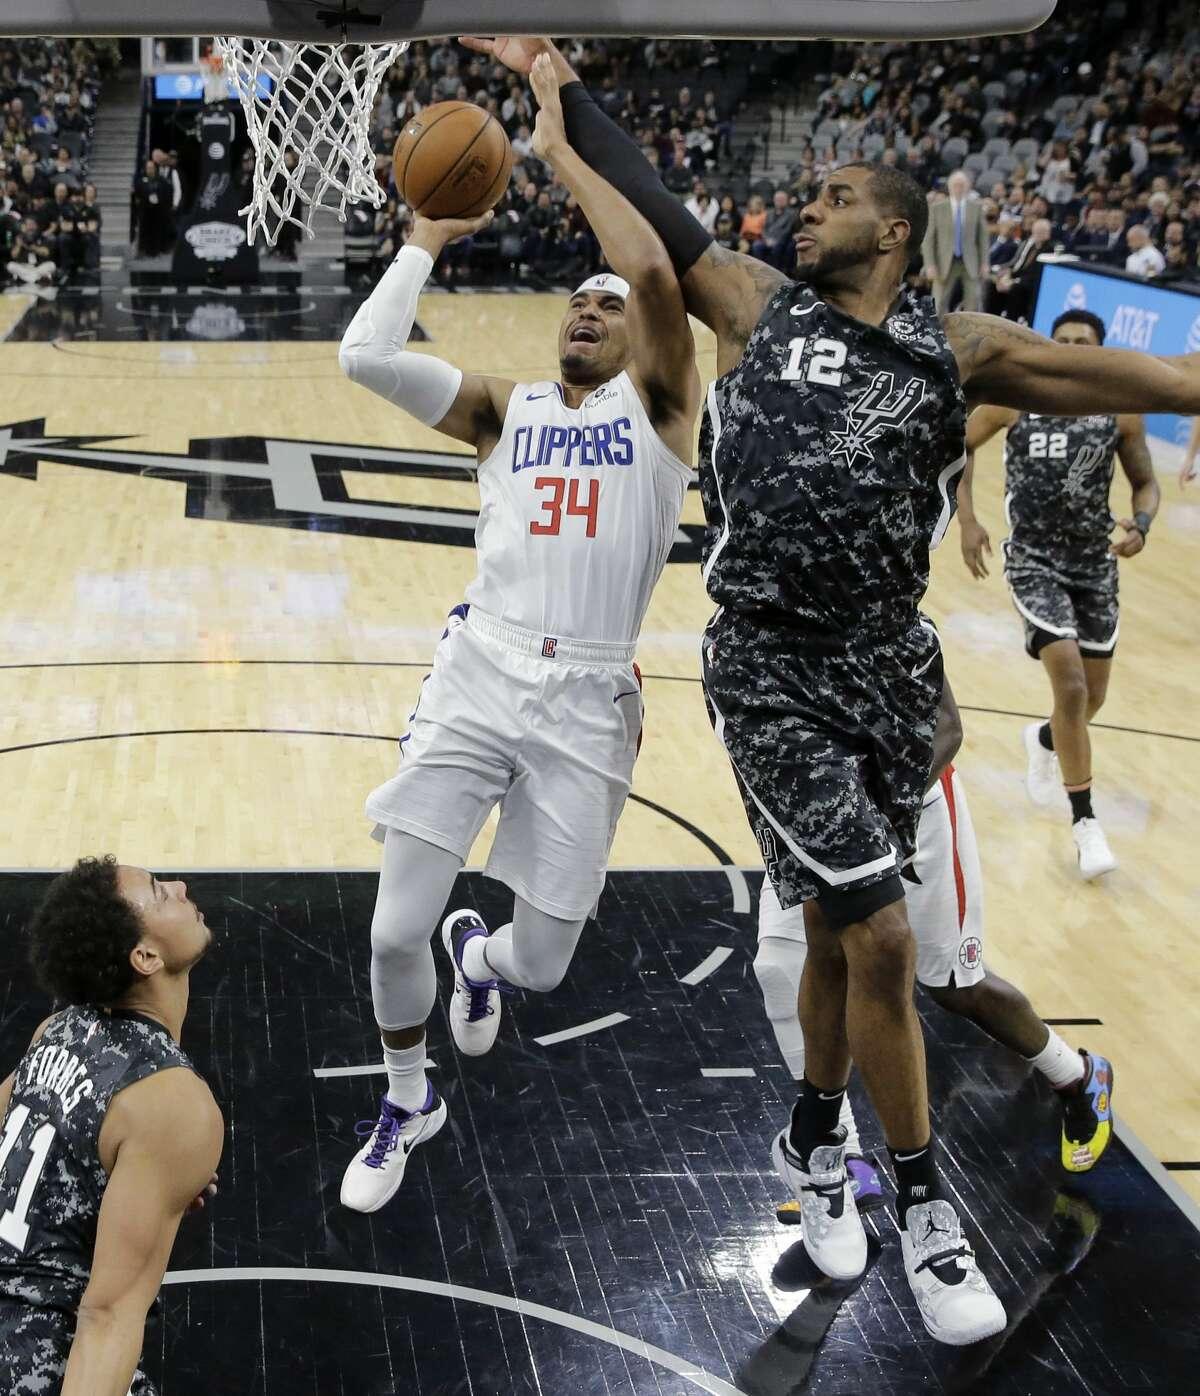 Los Angeles Clippers forward Tobias Harris (34) drives to the basket against San Antonio Spurs forward LaMarcus Aldridge (12) during the first half of an NBA basketball game, Sunday, Jan. 20, 2019, in San Antonio. (AP Photo/Eric Gay)